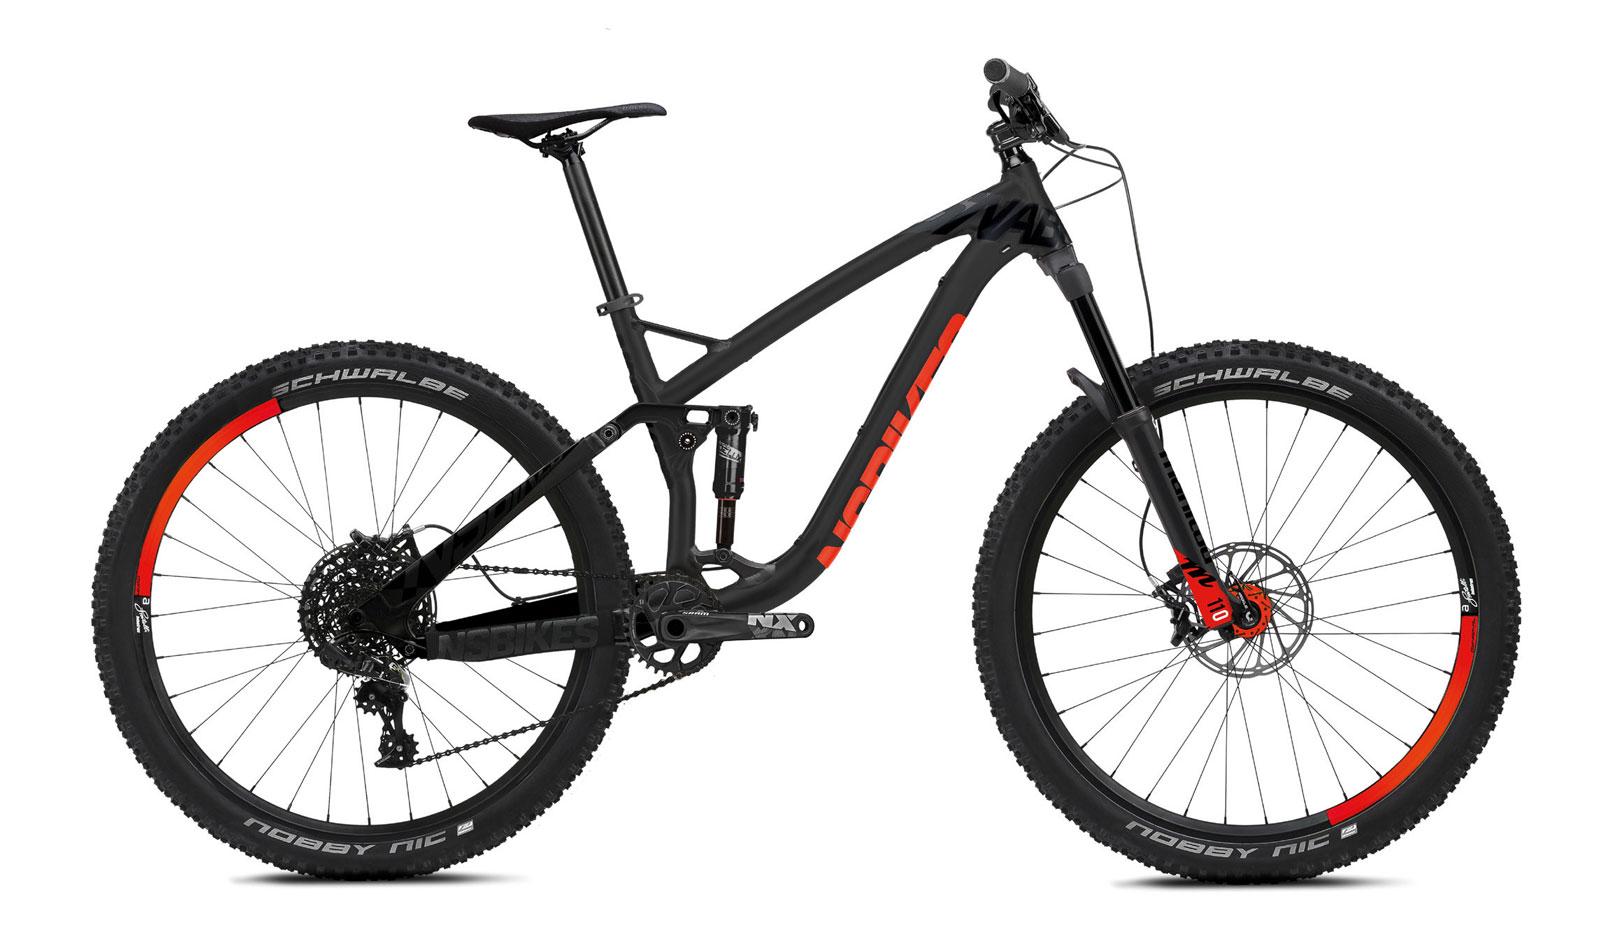 NS Bikes Snabb Plus 2